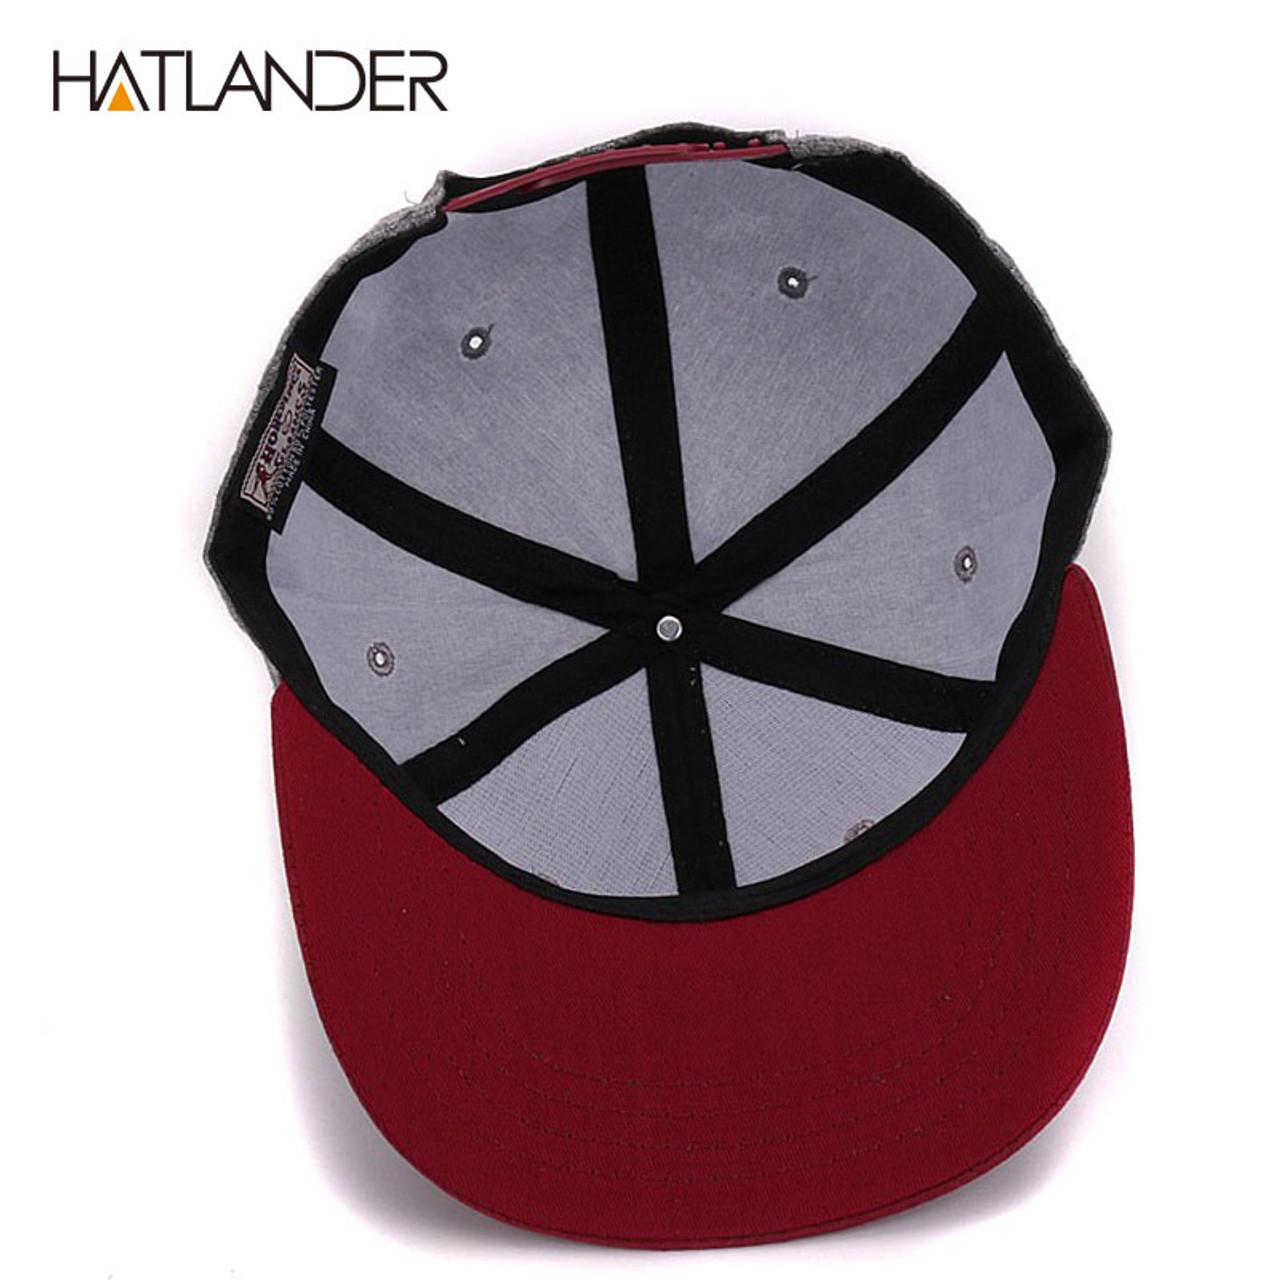 77da70d494eac ... HATLANDER branded adjustable baseball caps women Kpop hip hop cap  outdoor flat brim mens hats gorras ...